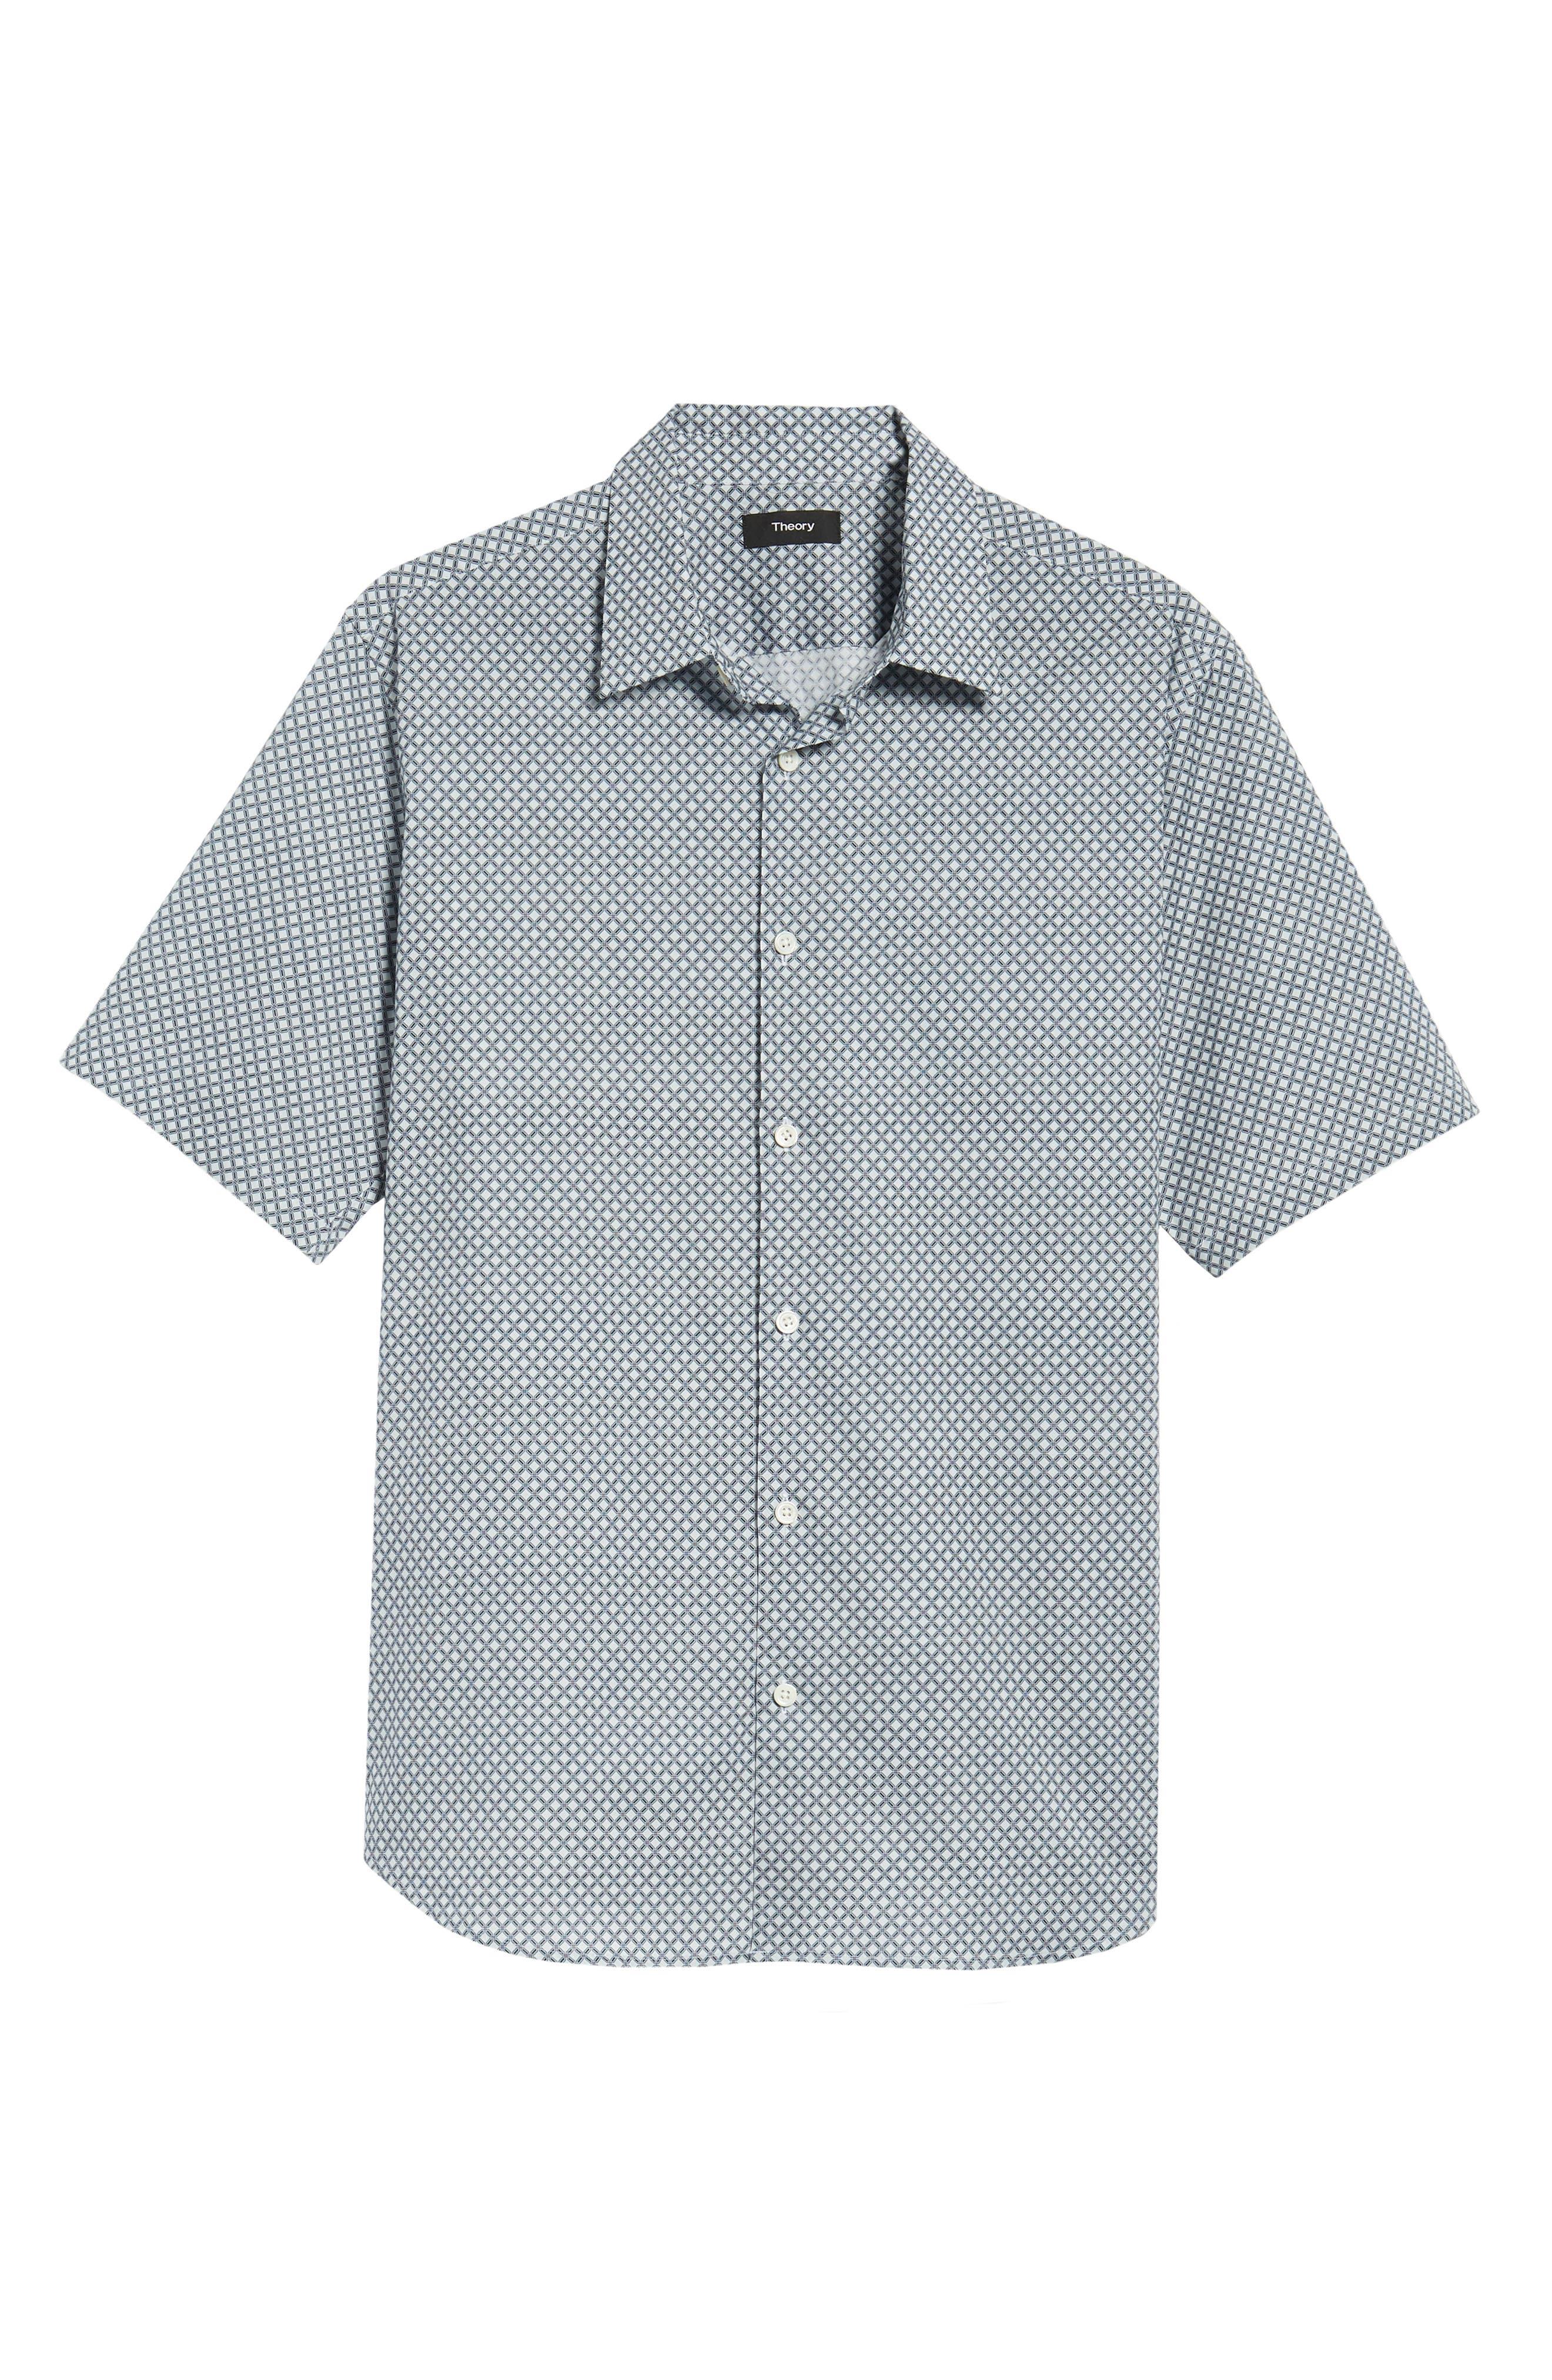 Menlo Halldale Slim Fit Stretch Short Sleeve Sport Shirt,                             Alternate thumbnail 6, color,                             Shale Multi